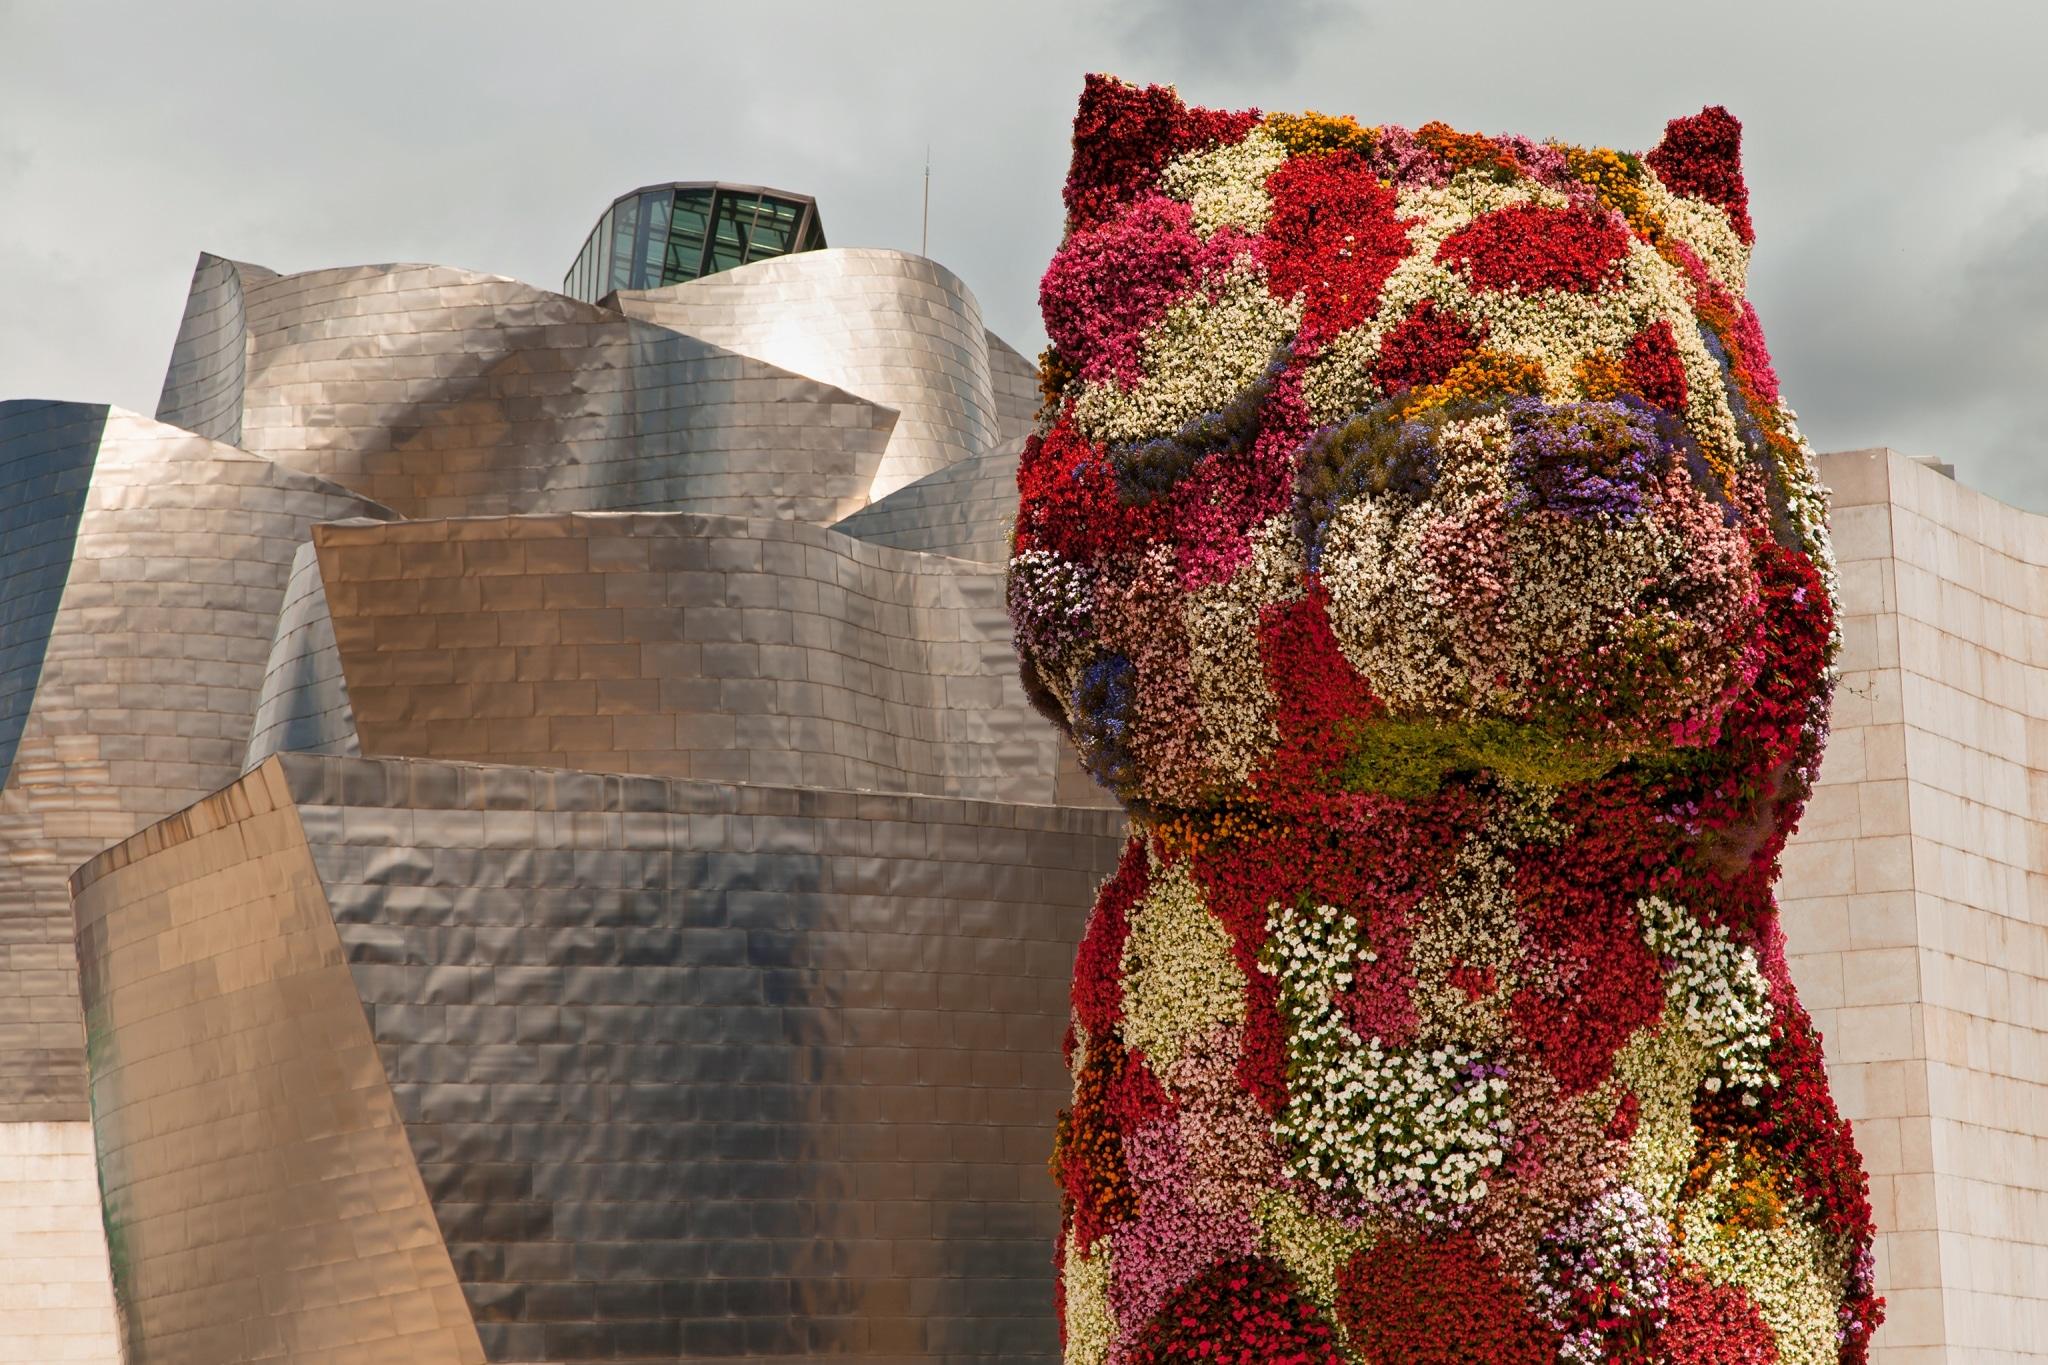 Escultura de Jeff Kooks frente al Guggenheim de Bilbao